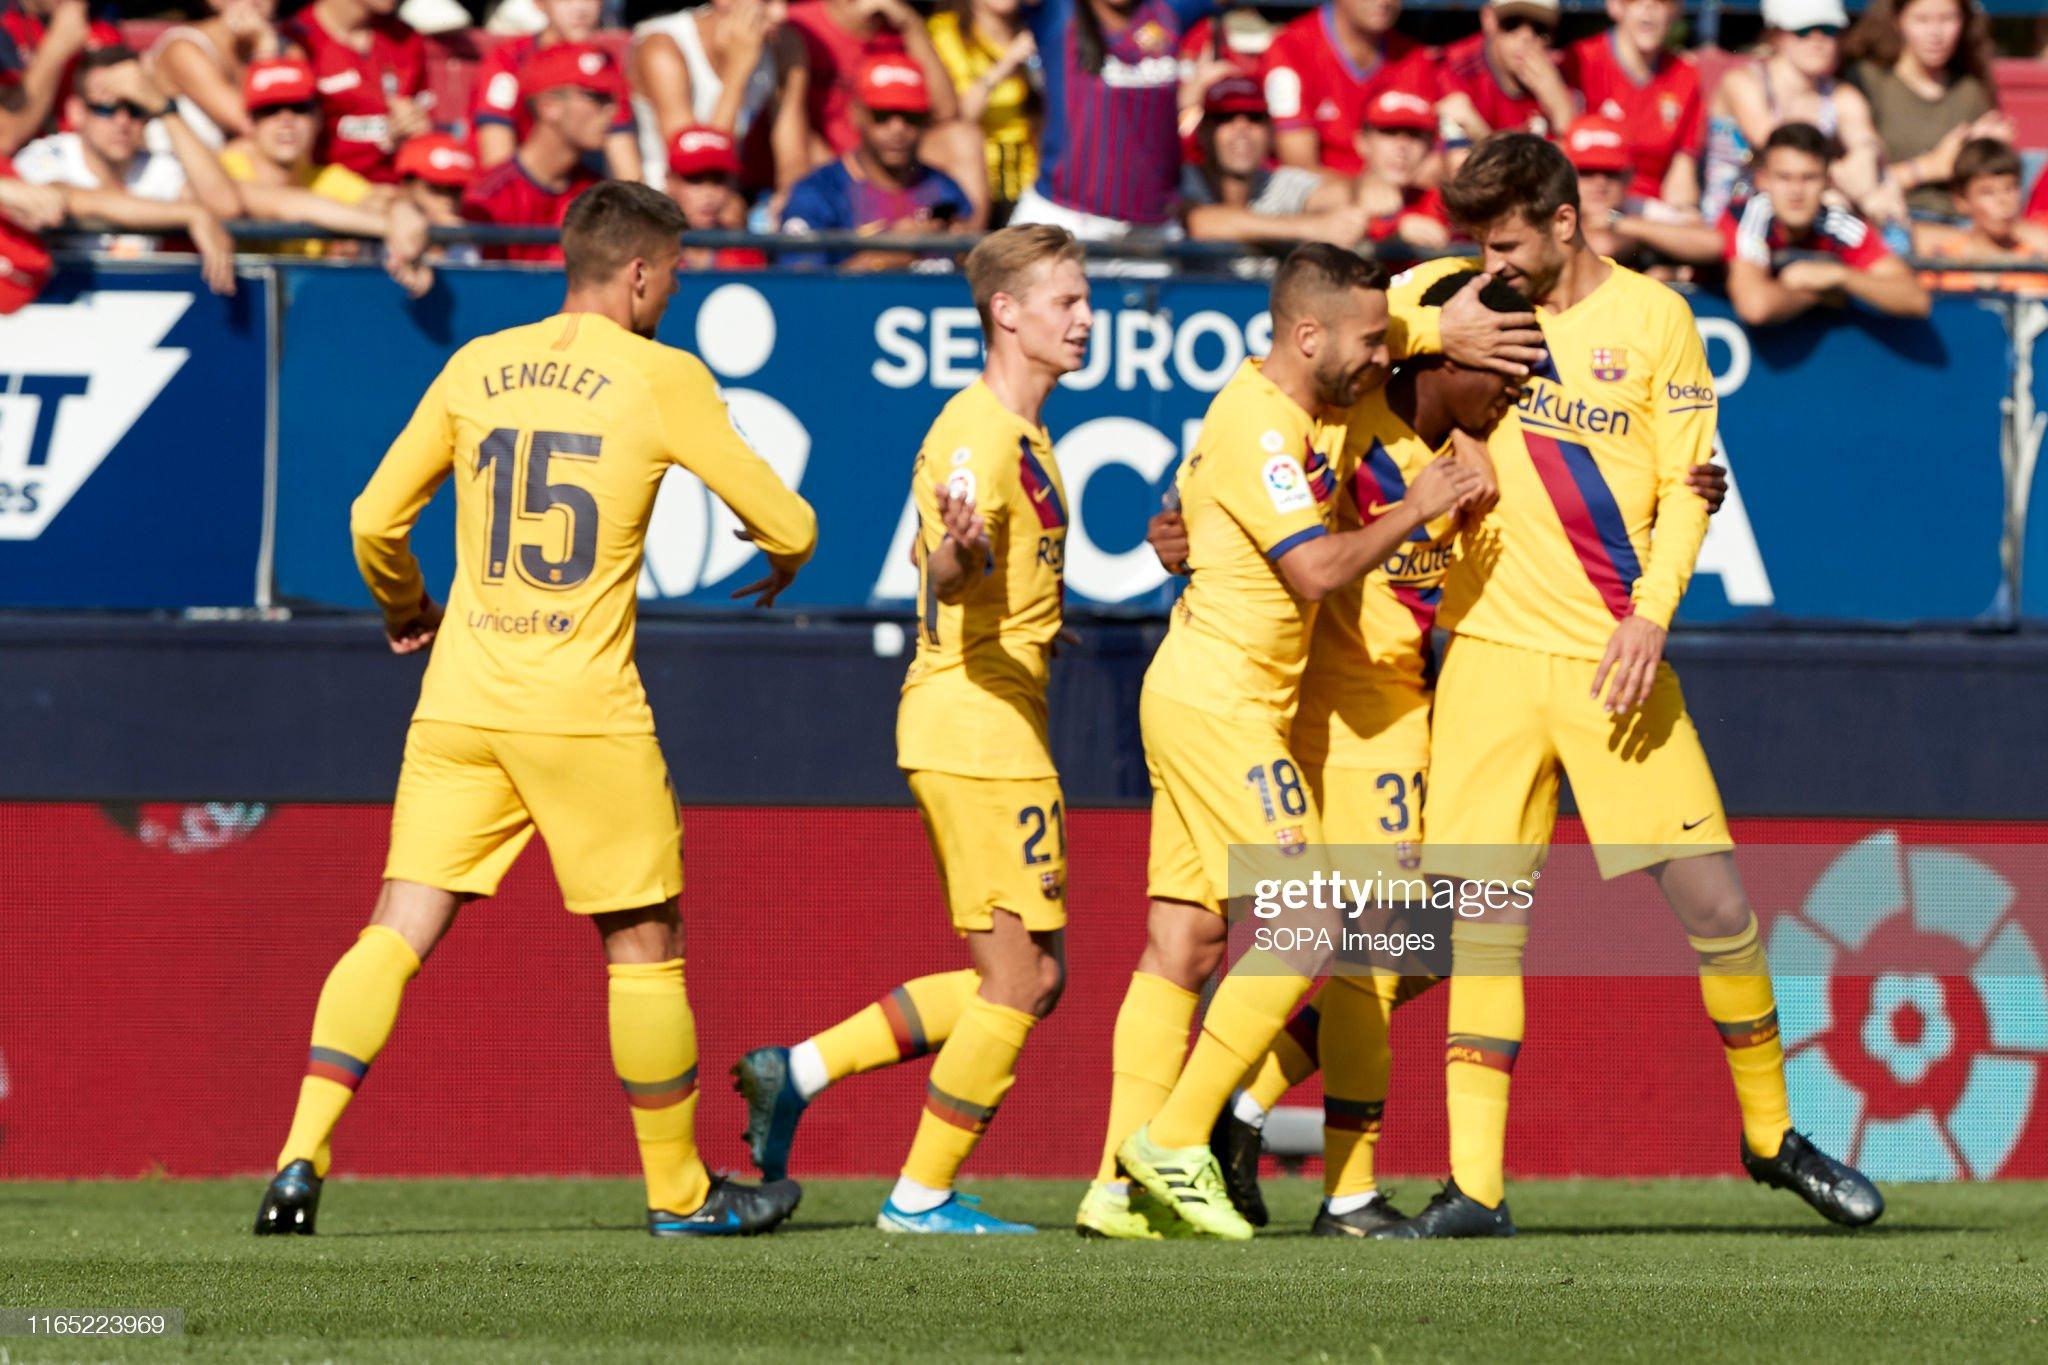 صور مباراة : أوساسونا - برشلونة 2-2 ( 31-08-2019 )  Barcelona-celebrates-a-goal-during-the-spanish-la-liga-santander-ca-picture-id1165223969?s=2048x2048